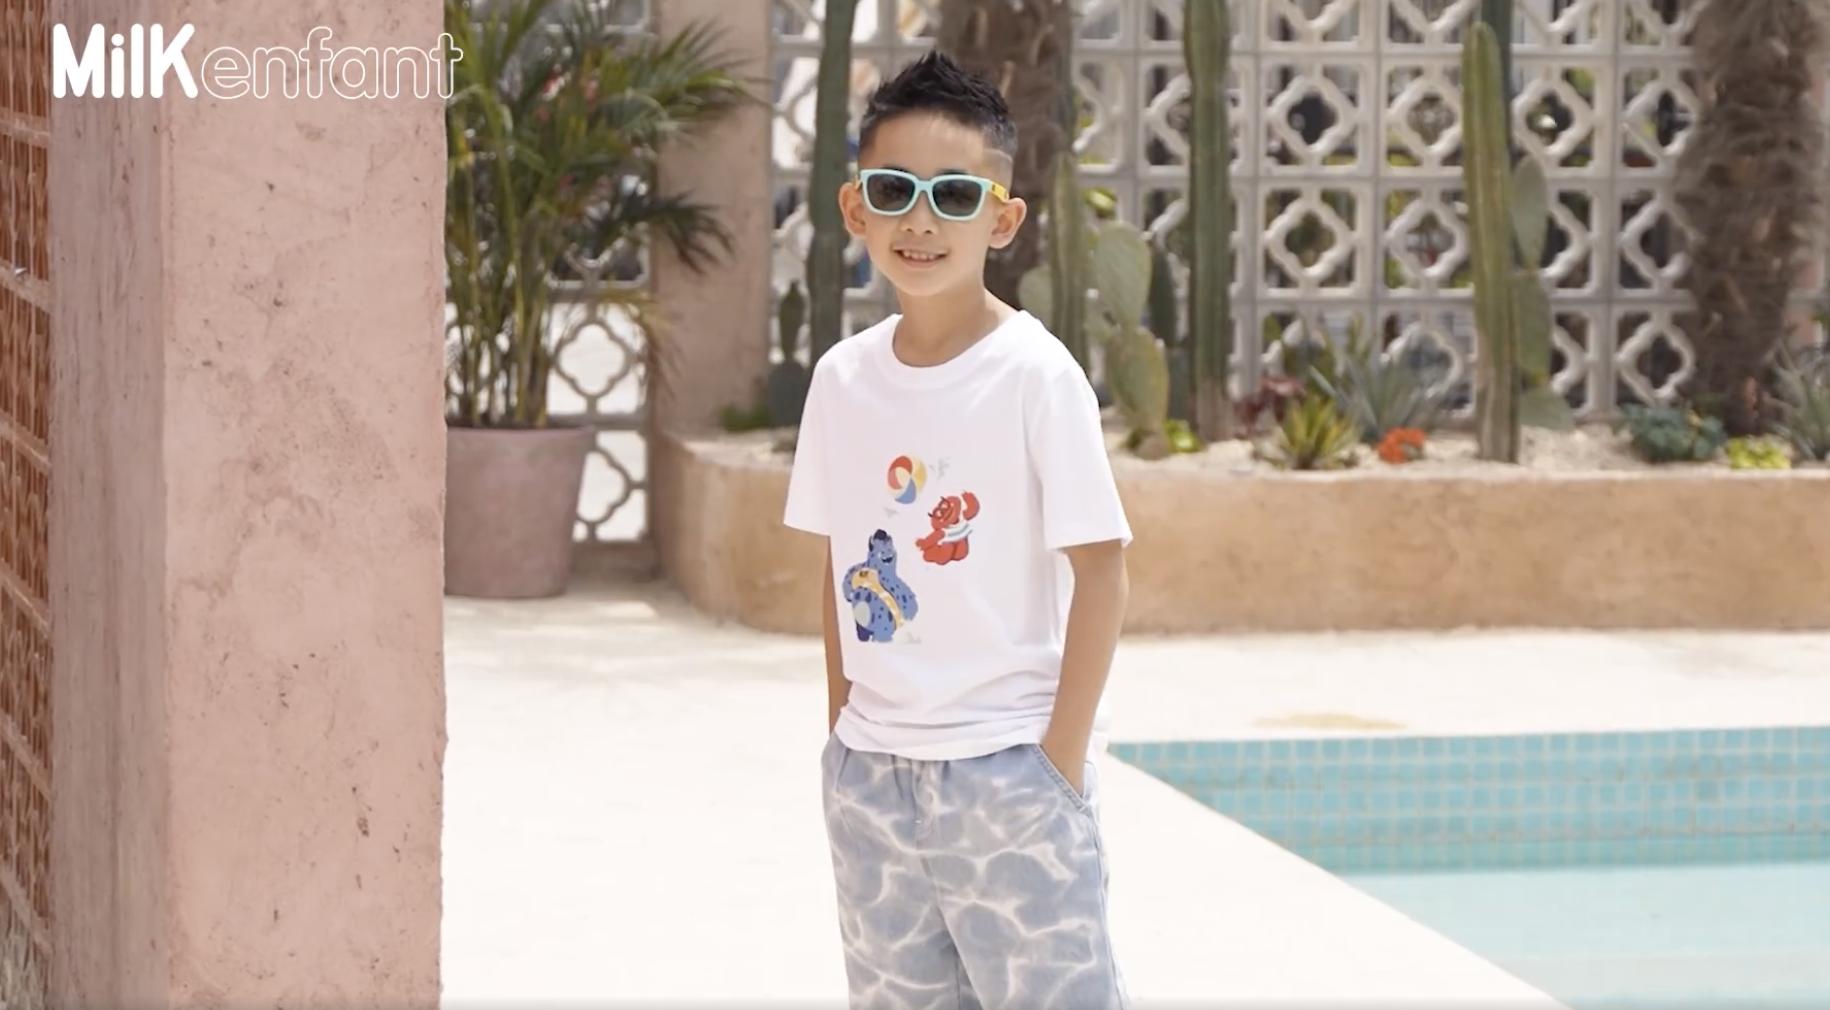 Jasper拍六一写真,8岁小小春长成翩翩少年,玩水吹泡泡充满童趣